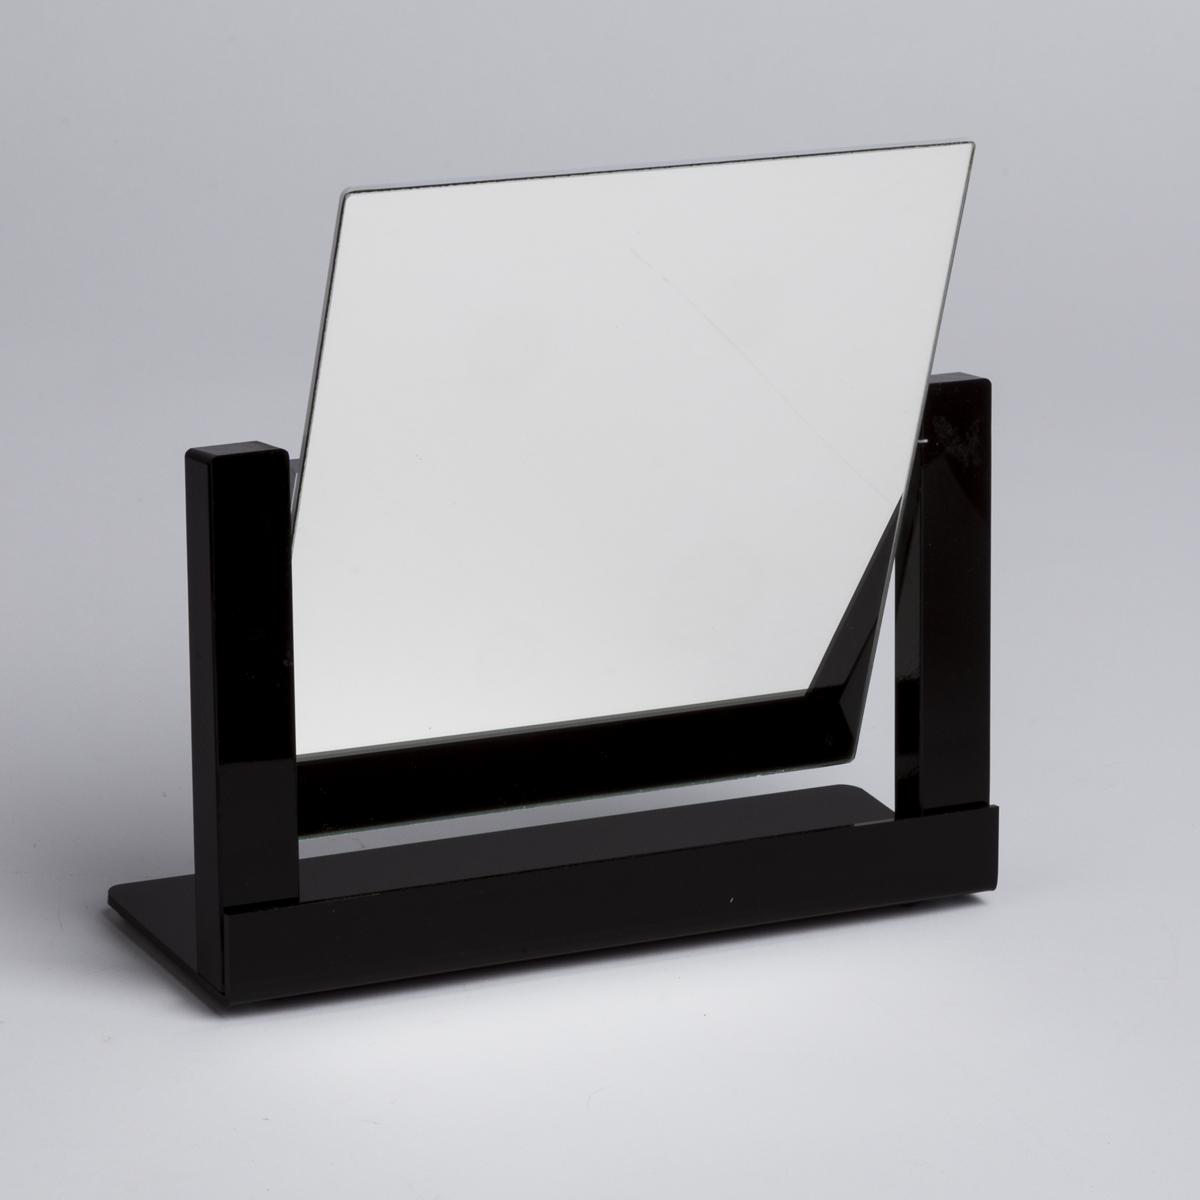 Countertop Mirror : Jewelry Mirror - Countertop, Black Frame A&B Store Fixtures